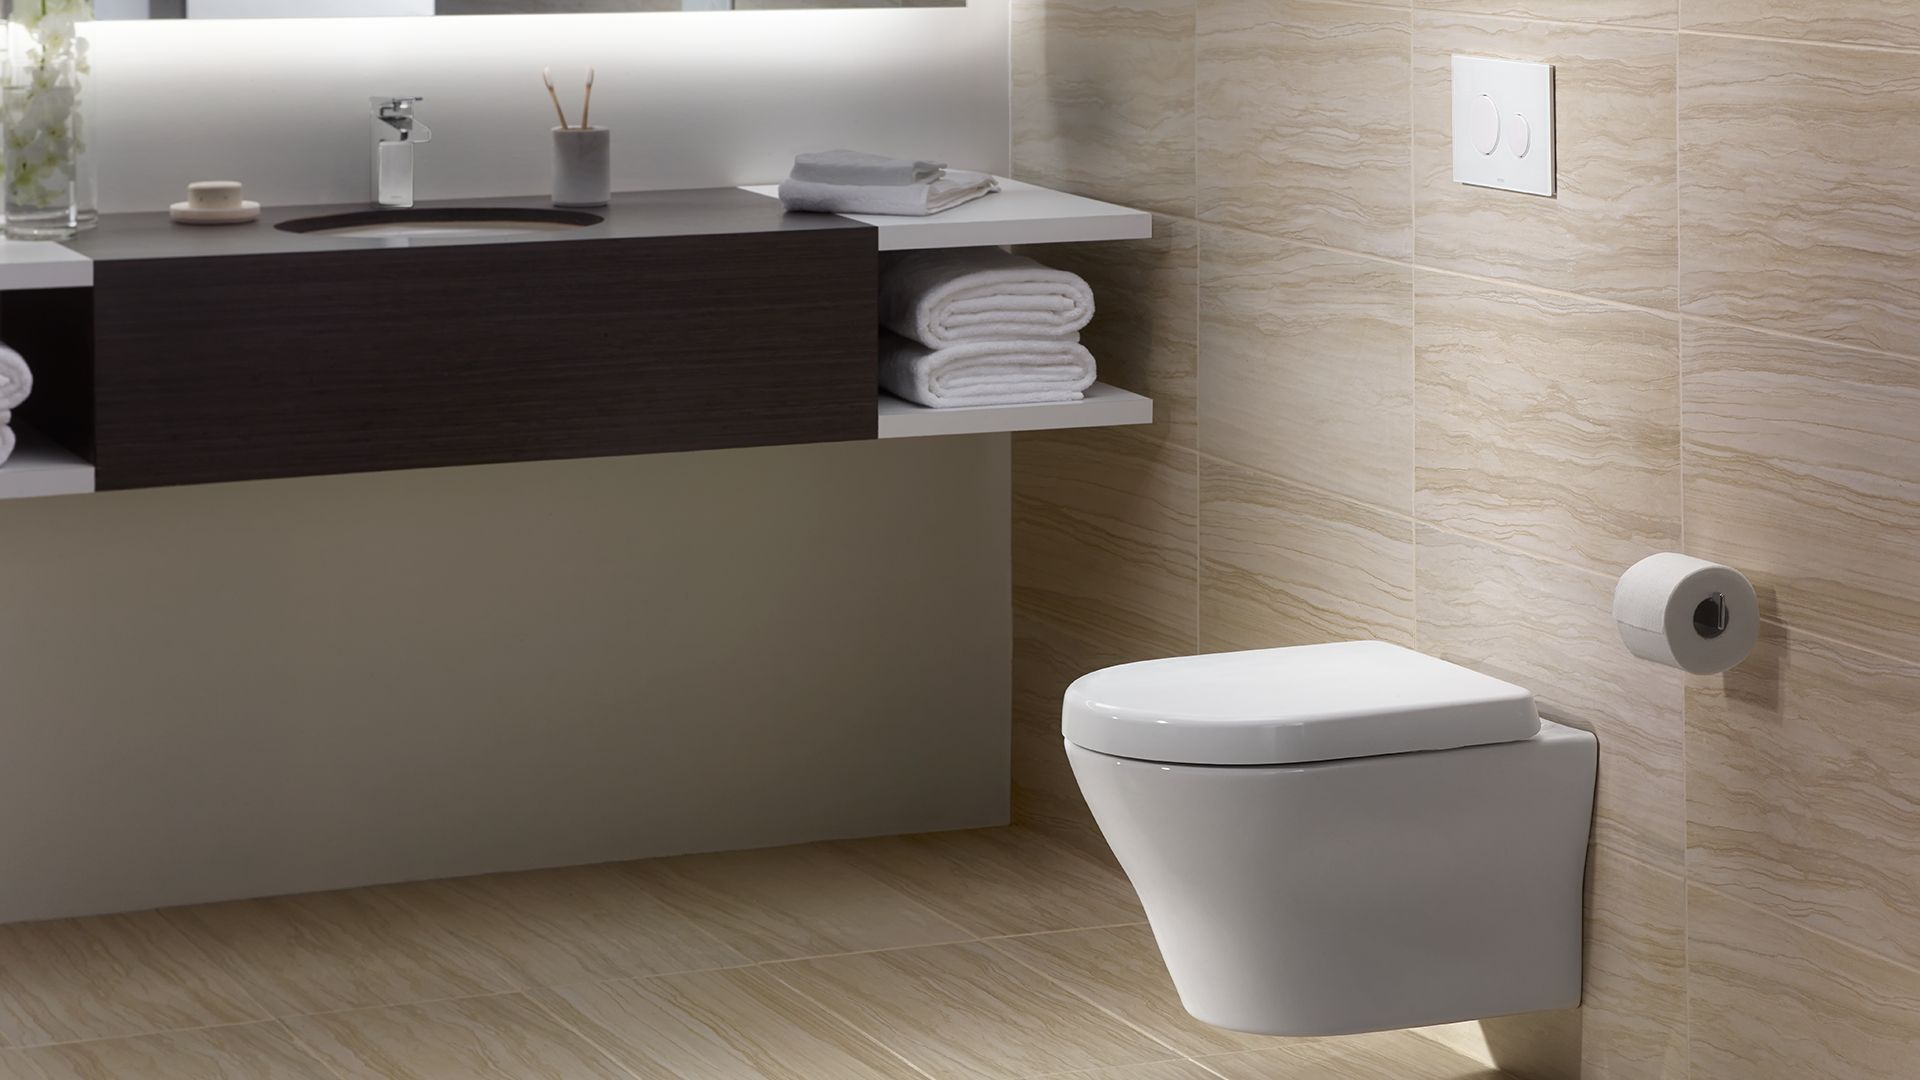 MH® Wall-Hung Dual-Flush Toilet, 1.28 GPF & 0.9 GPF, D-Shape Bowl